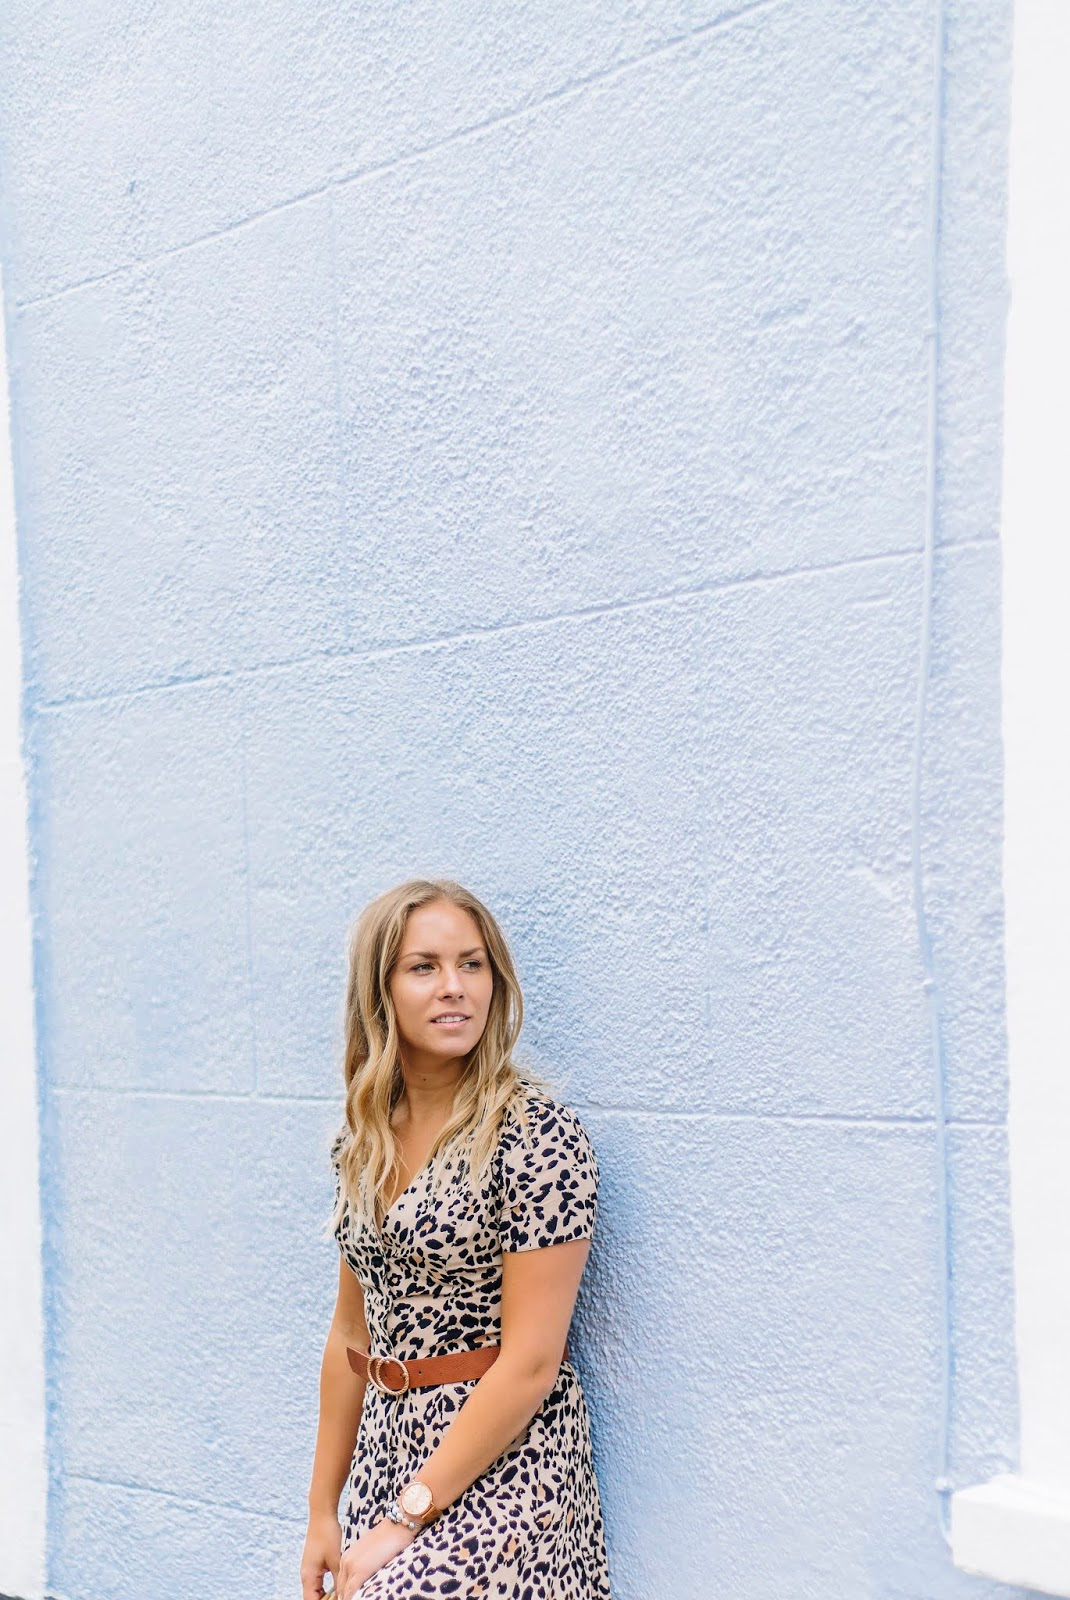 Fashion   How to Wear Leopard Print this Season - Rachel Emily Blog